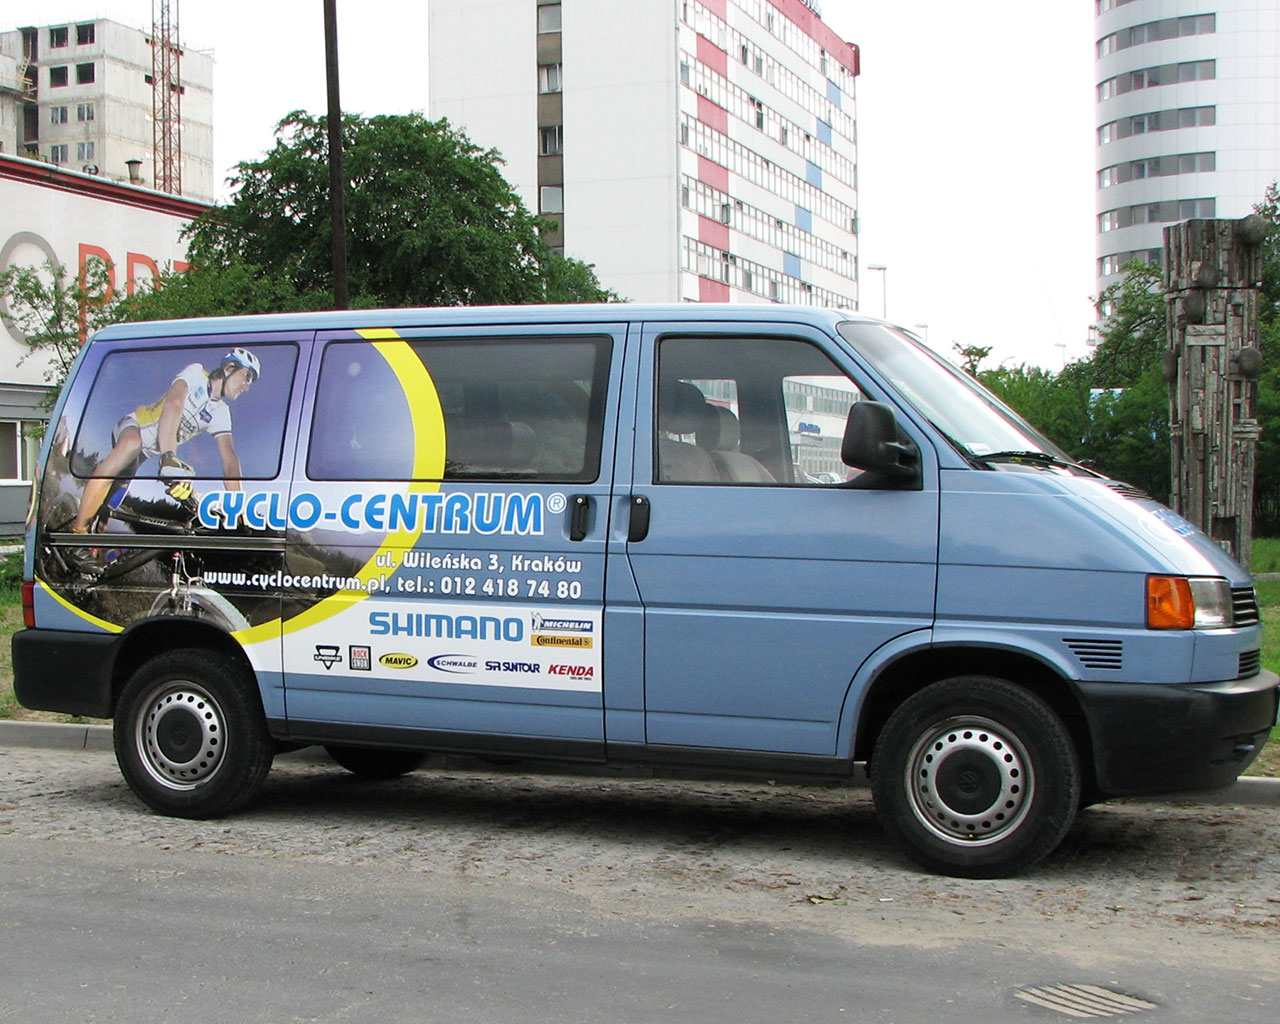 cyclo-centrum